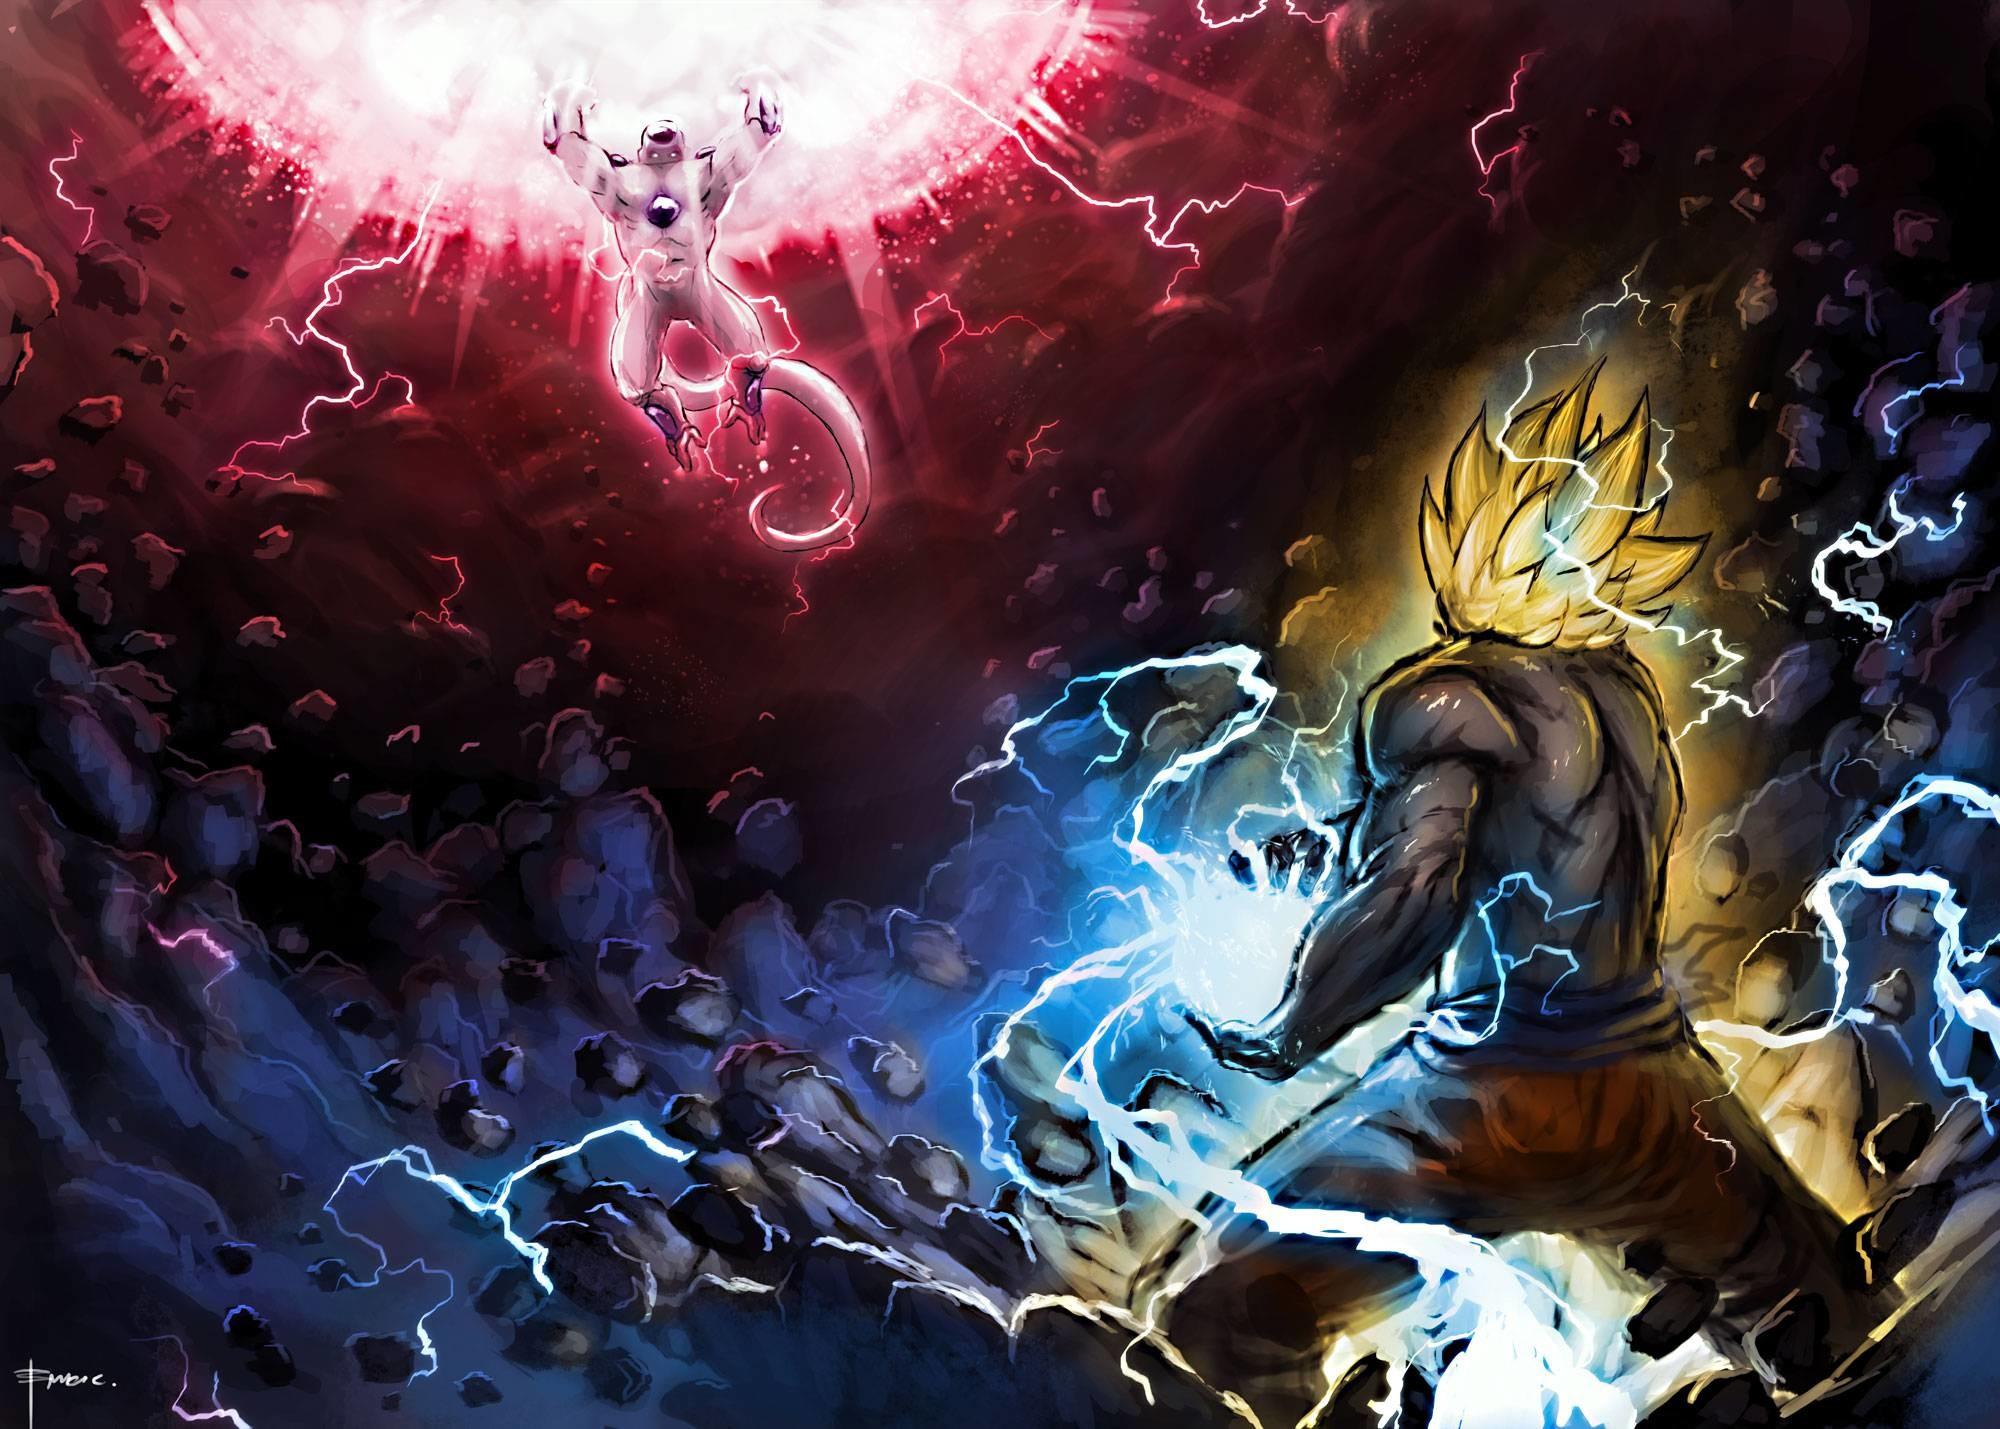 Goku vs Frieza – DragonBall z Wallpaper